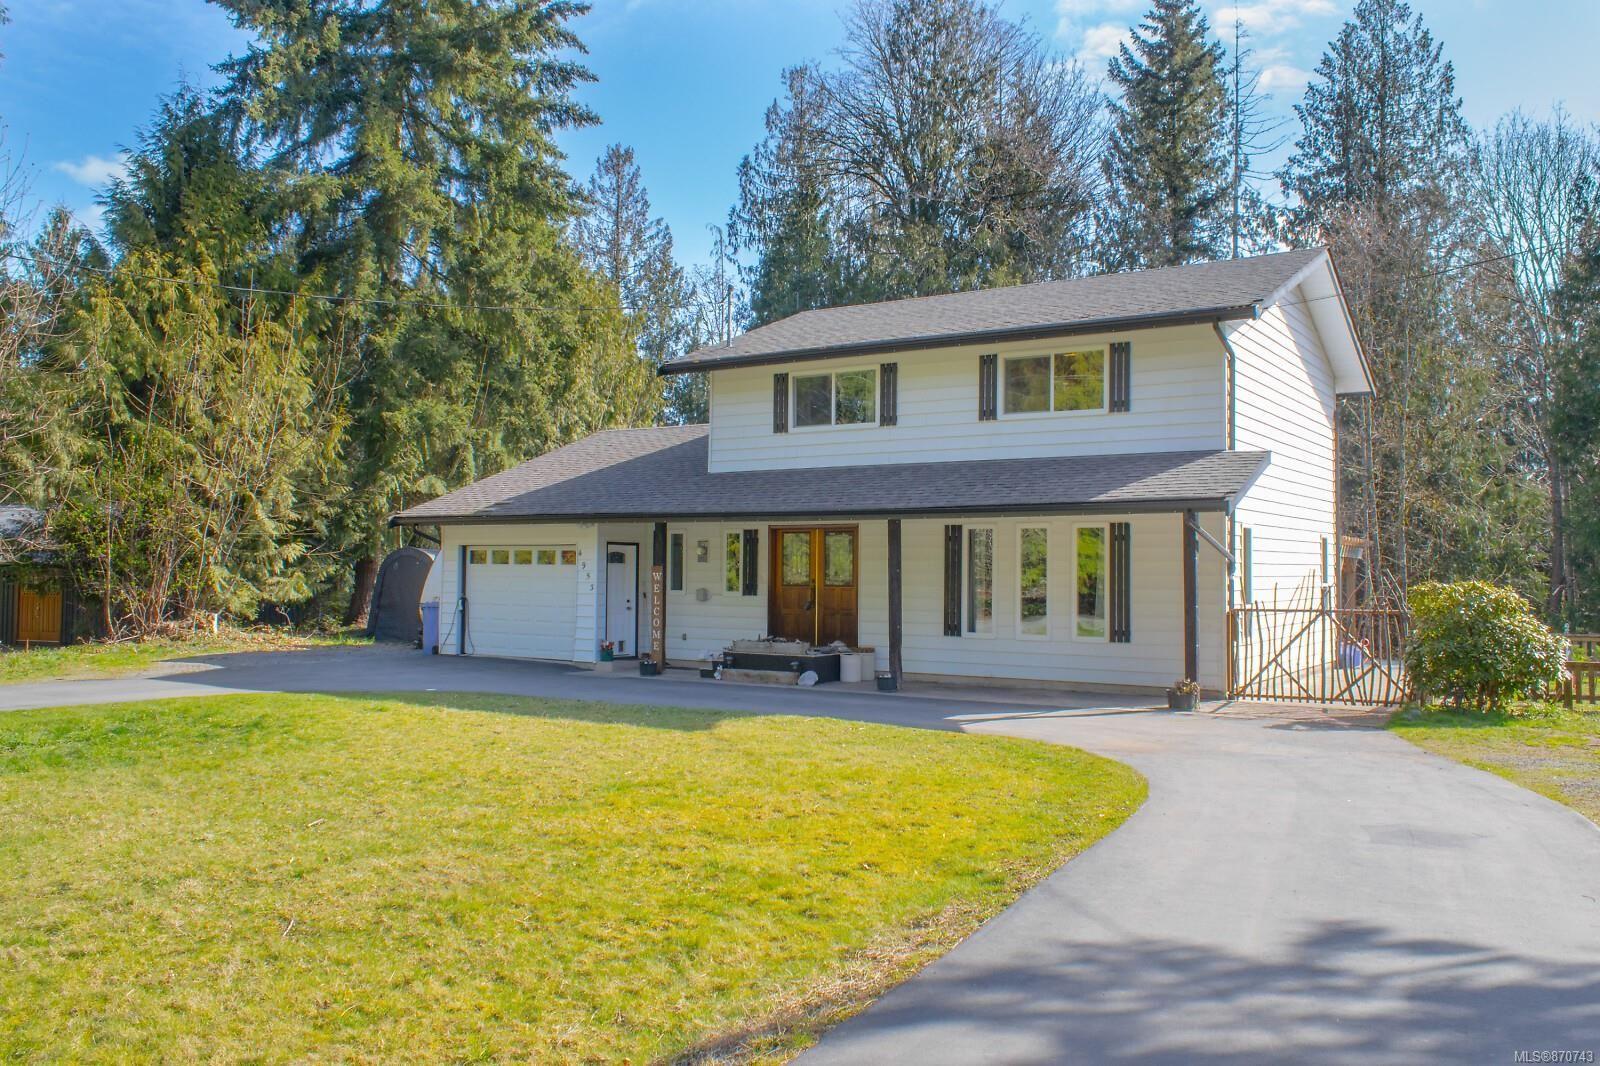 Main Photo: 4953 Homestead Way in : Na Cedar House for sale (Nanaimo)  : MLS®# 870743